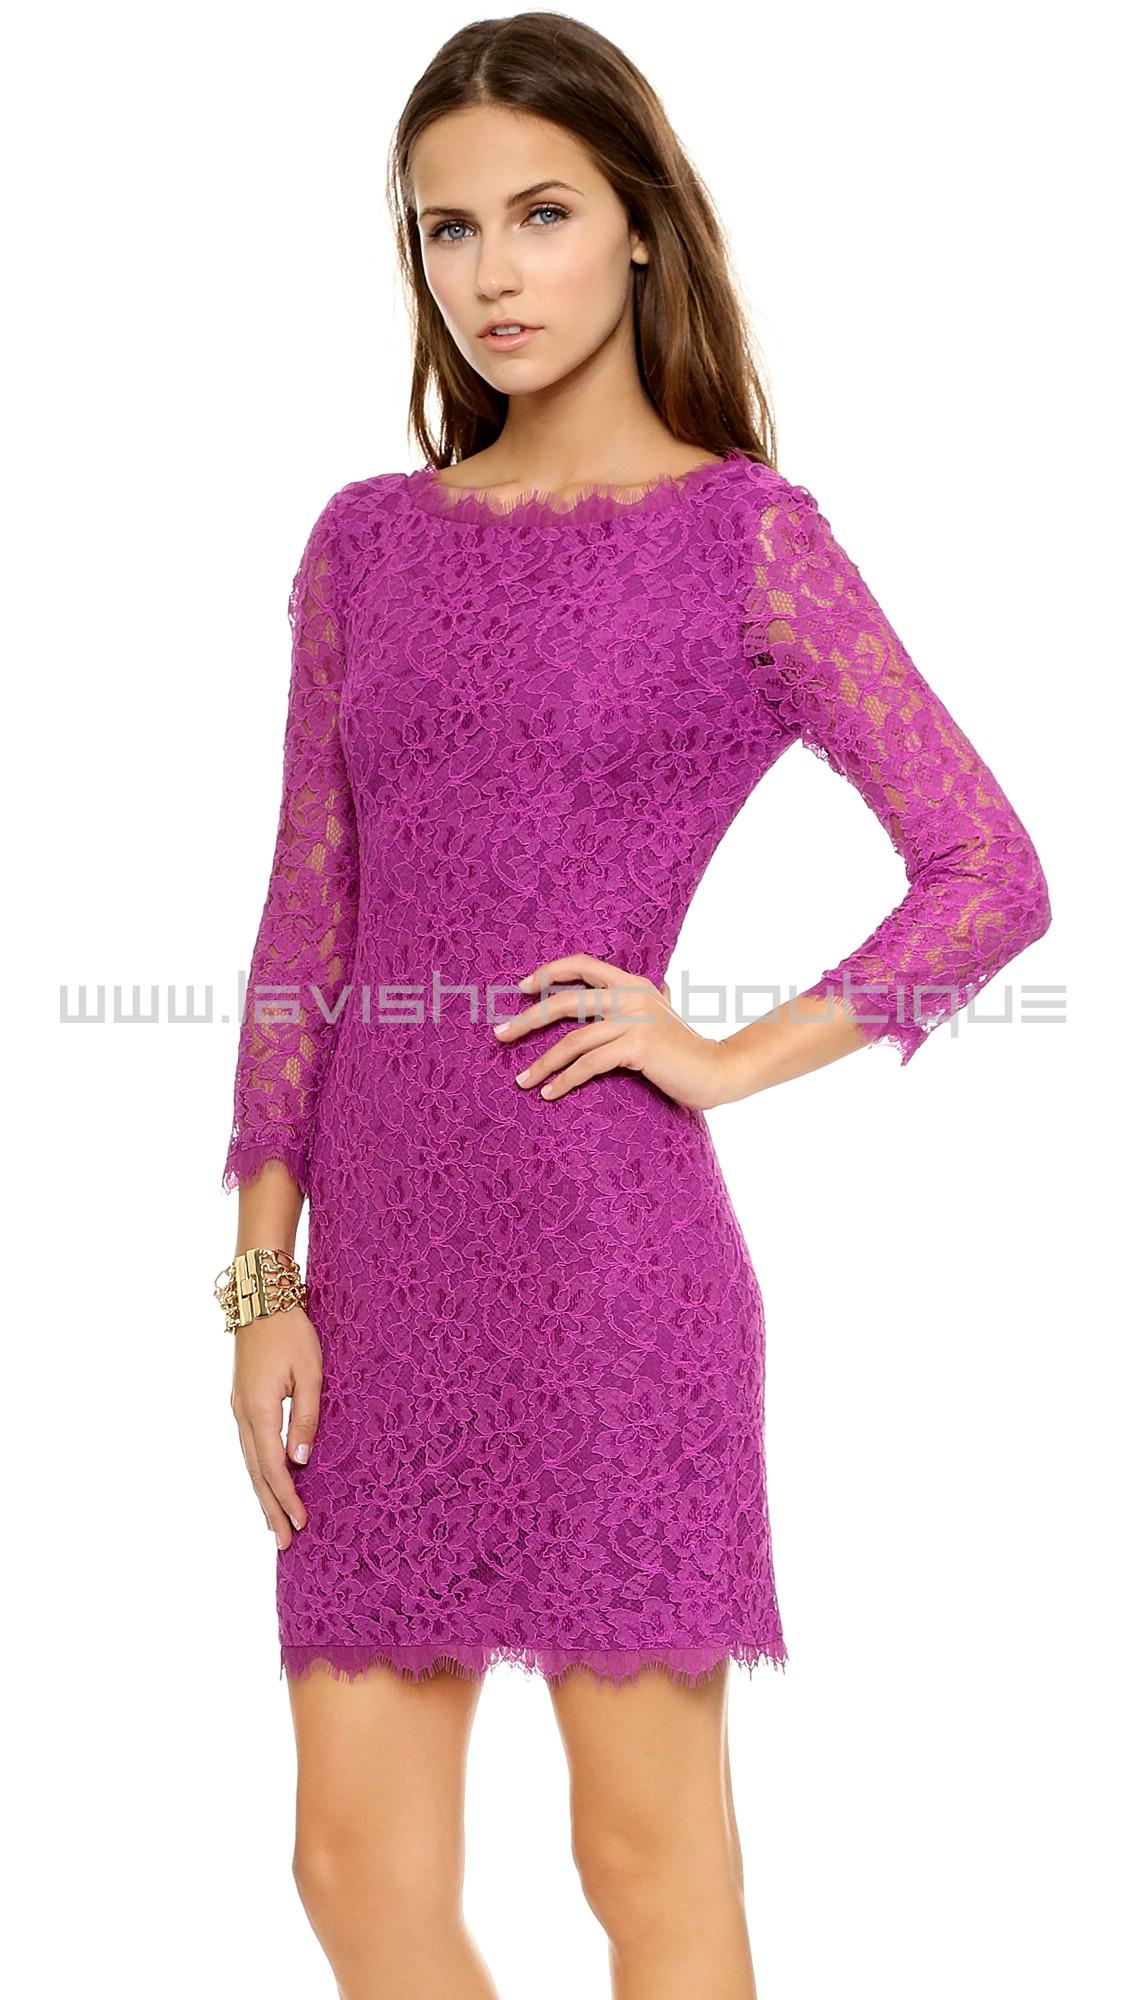 Dvf lace zarita dress with tights